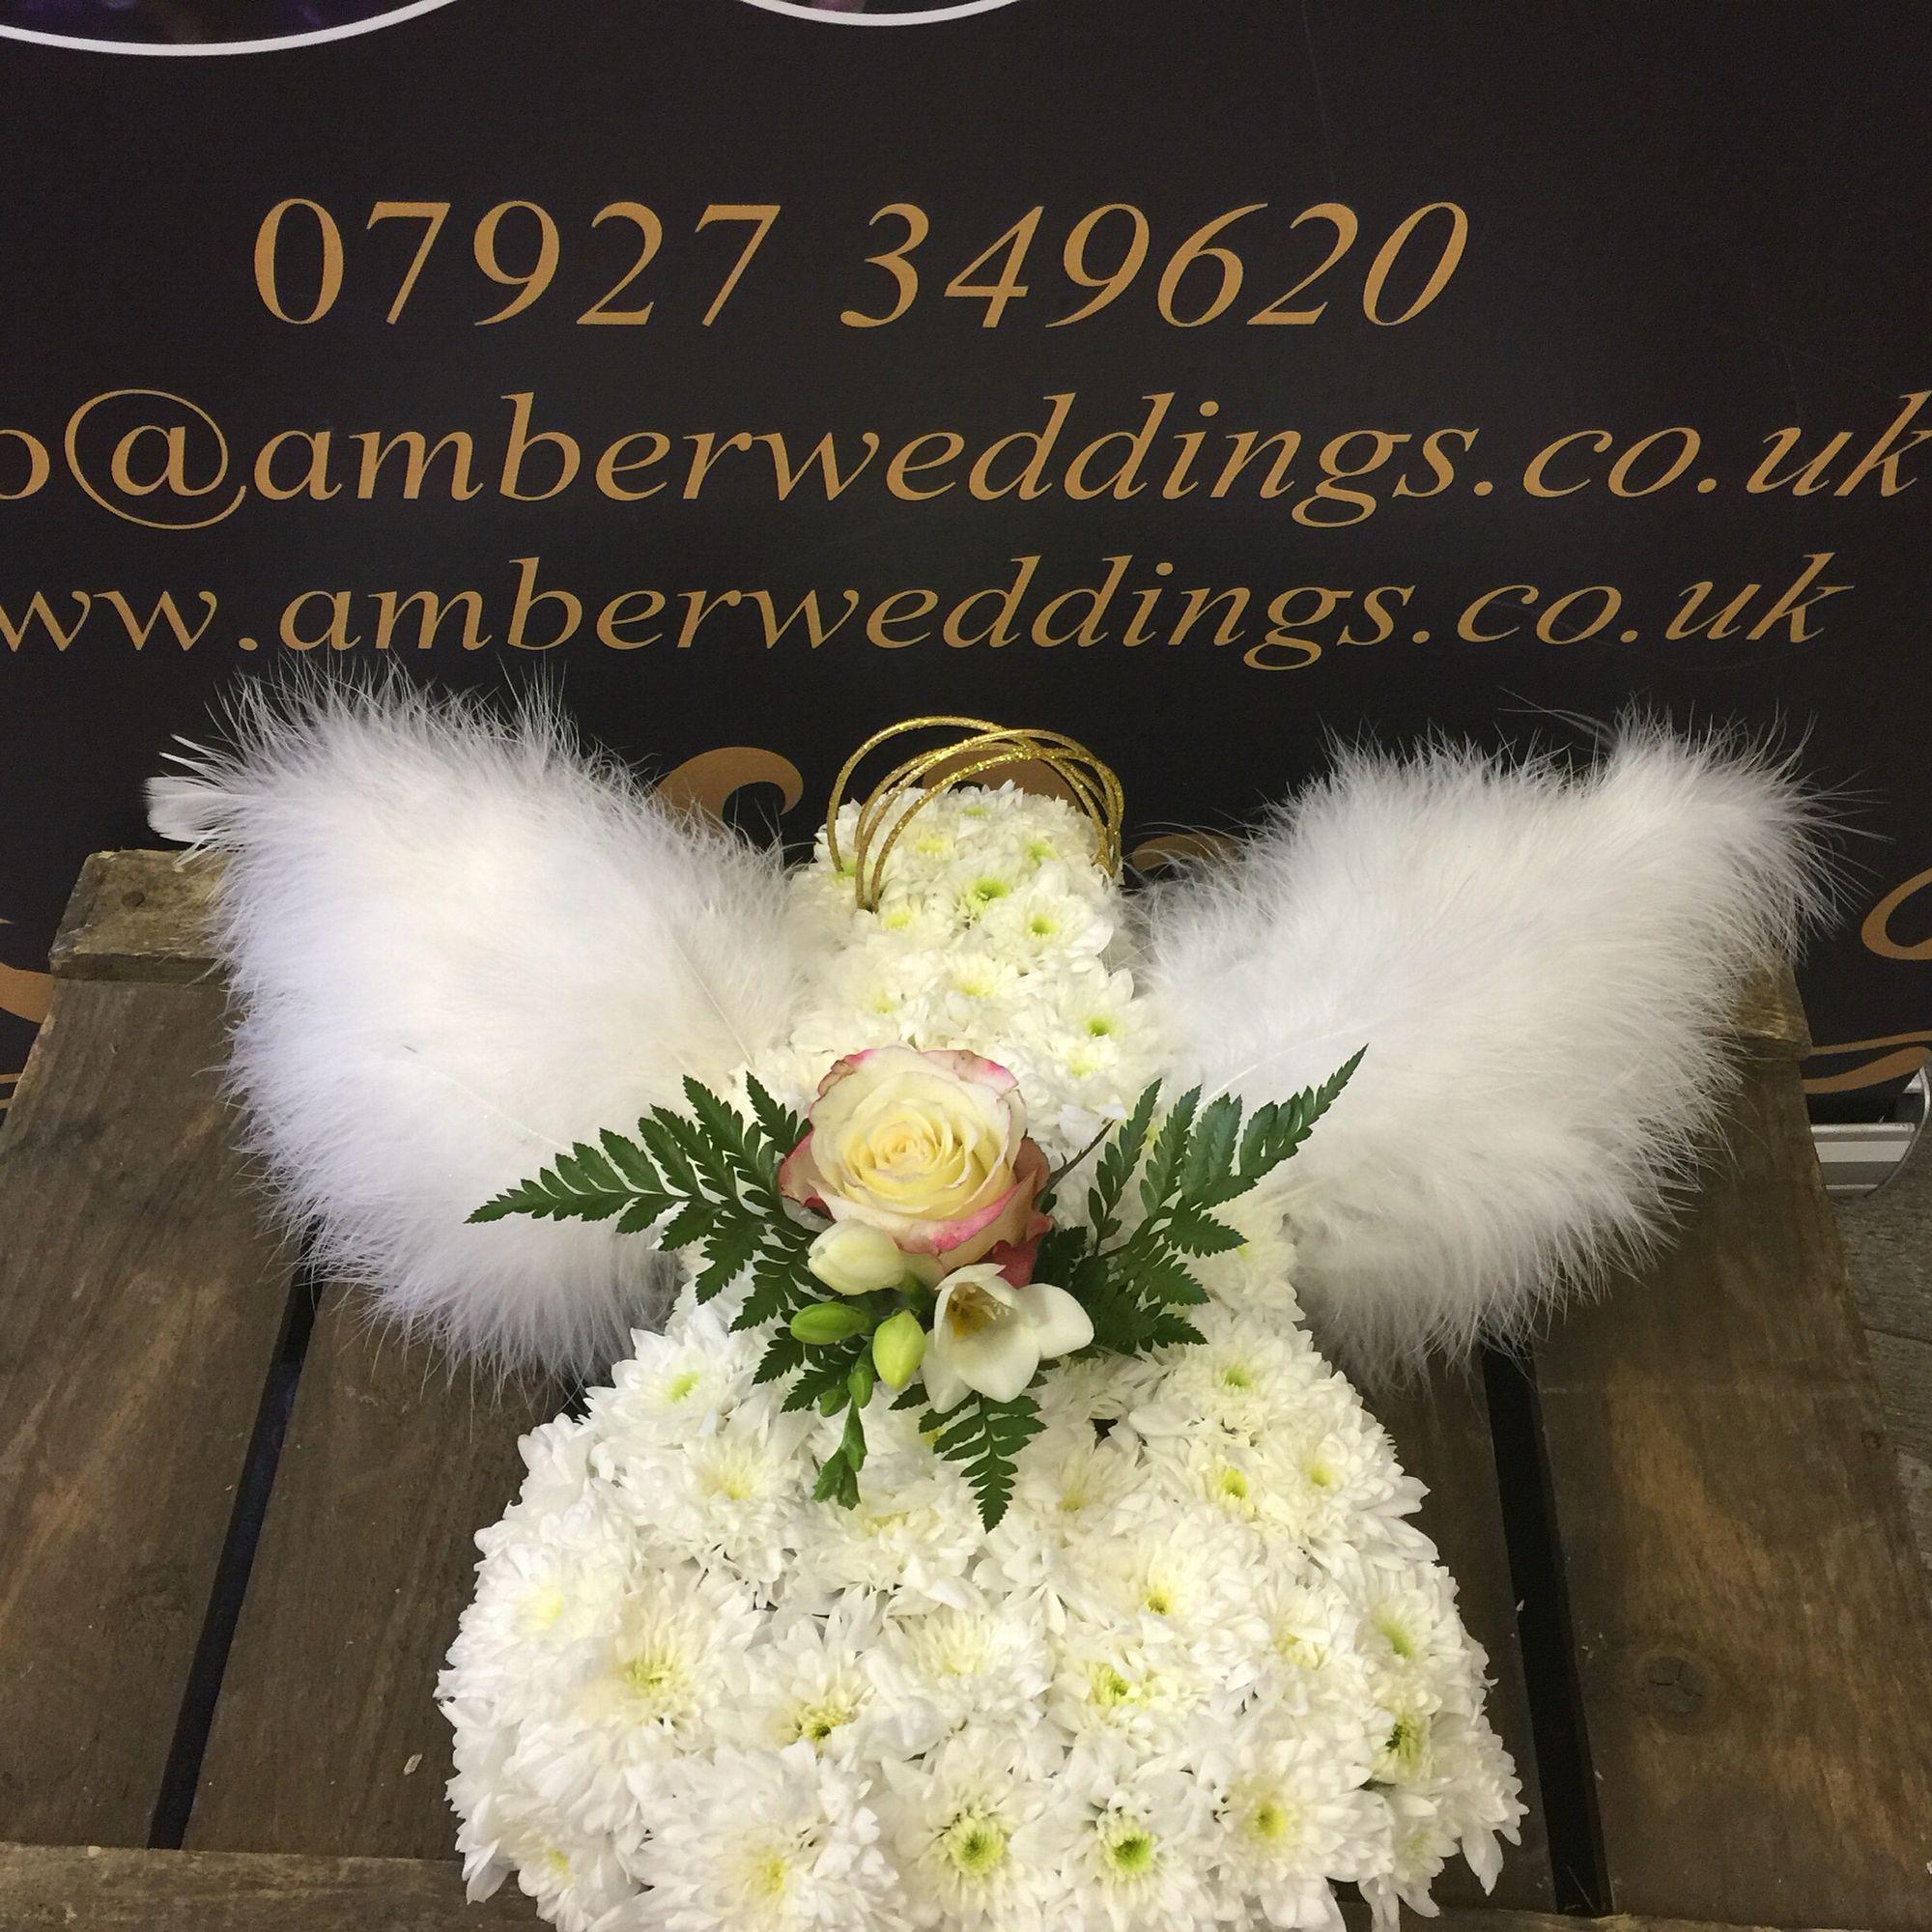 Mini angel funeral flowers by amber weddings amberweddings funeral mini angel funeral flowers by amber weddings izmirmasajfo